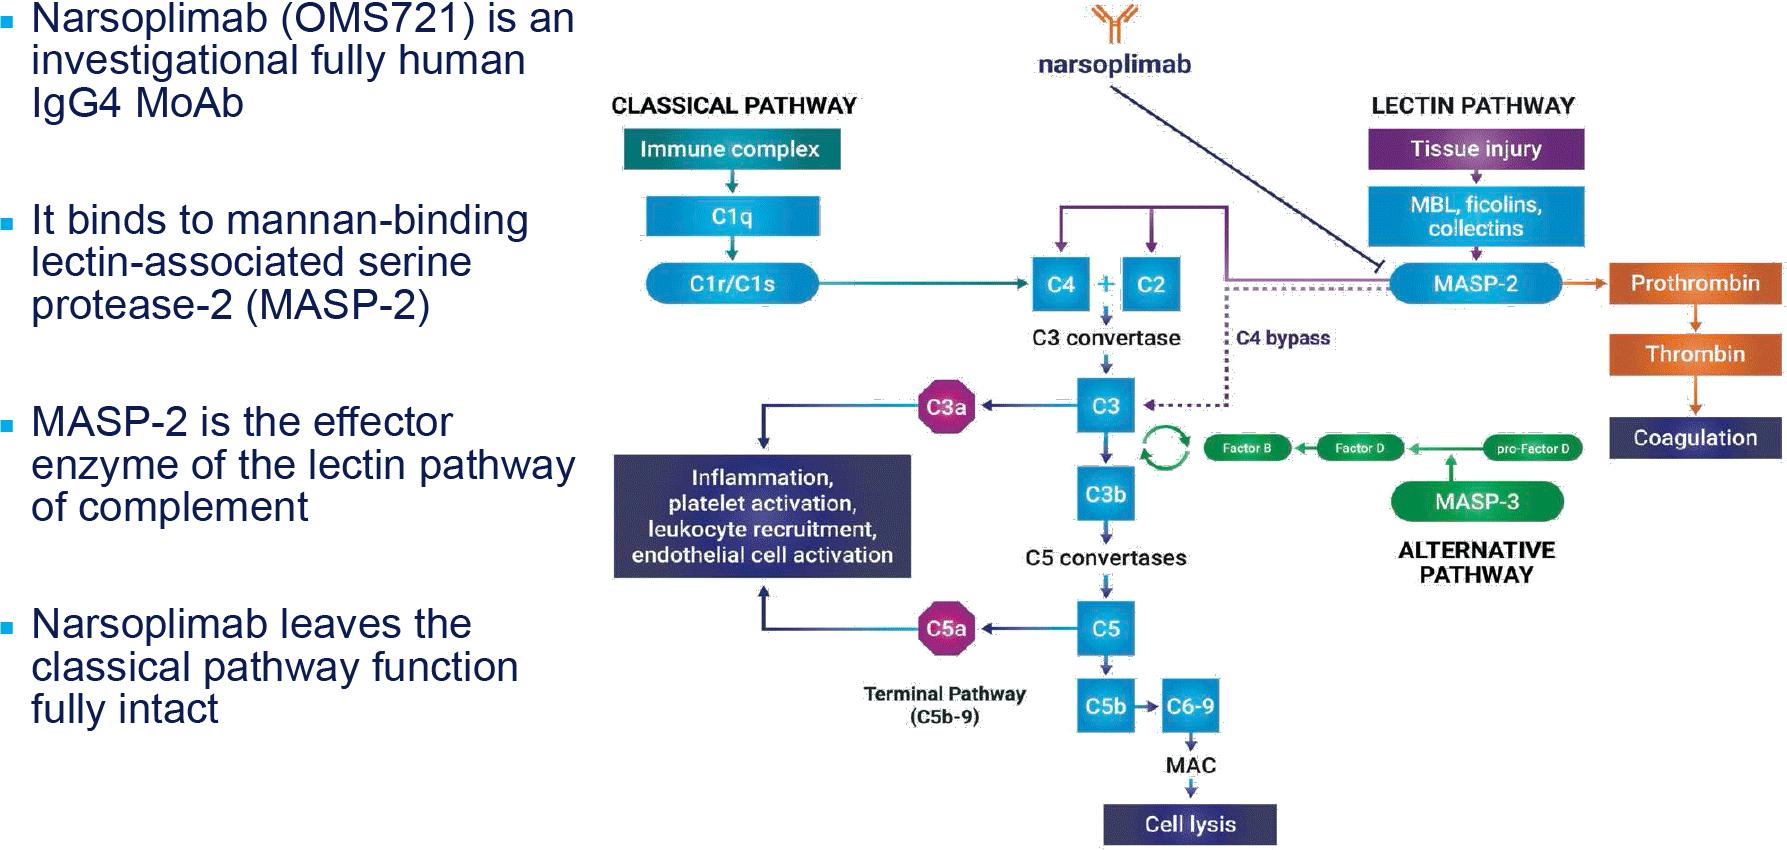 narsoplimab moa - Коронавирус. Лекарства. Нарсоплимаб: в помощь самым тяжелым пациентам с COVID-19